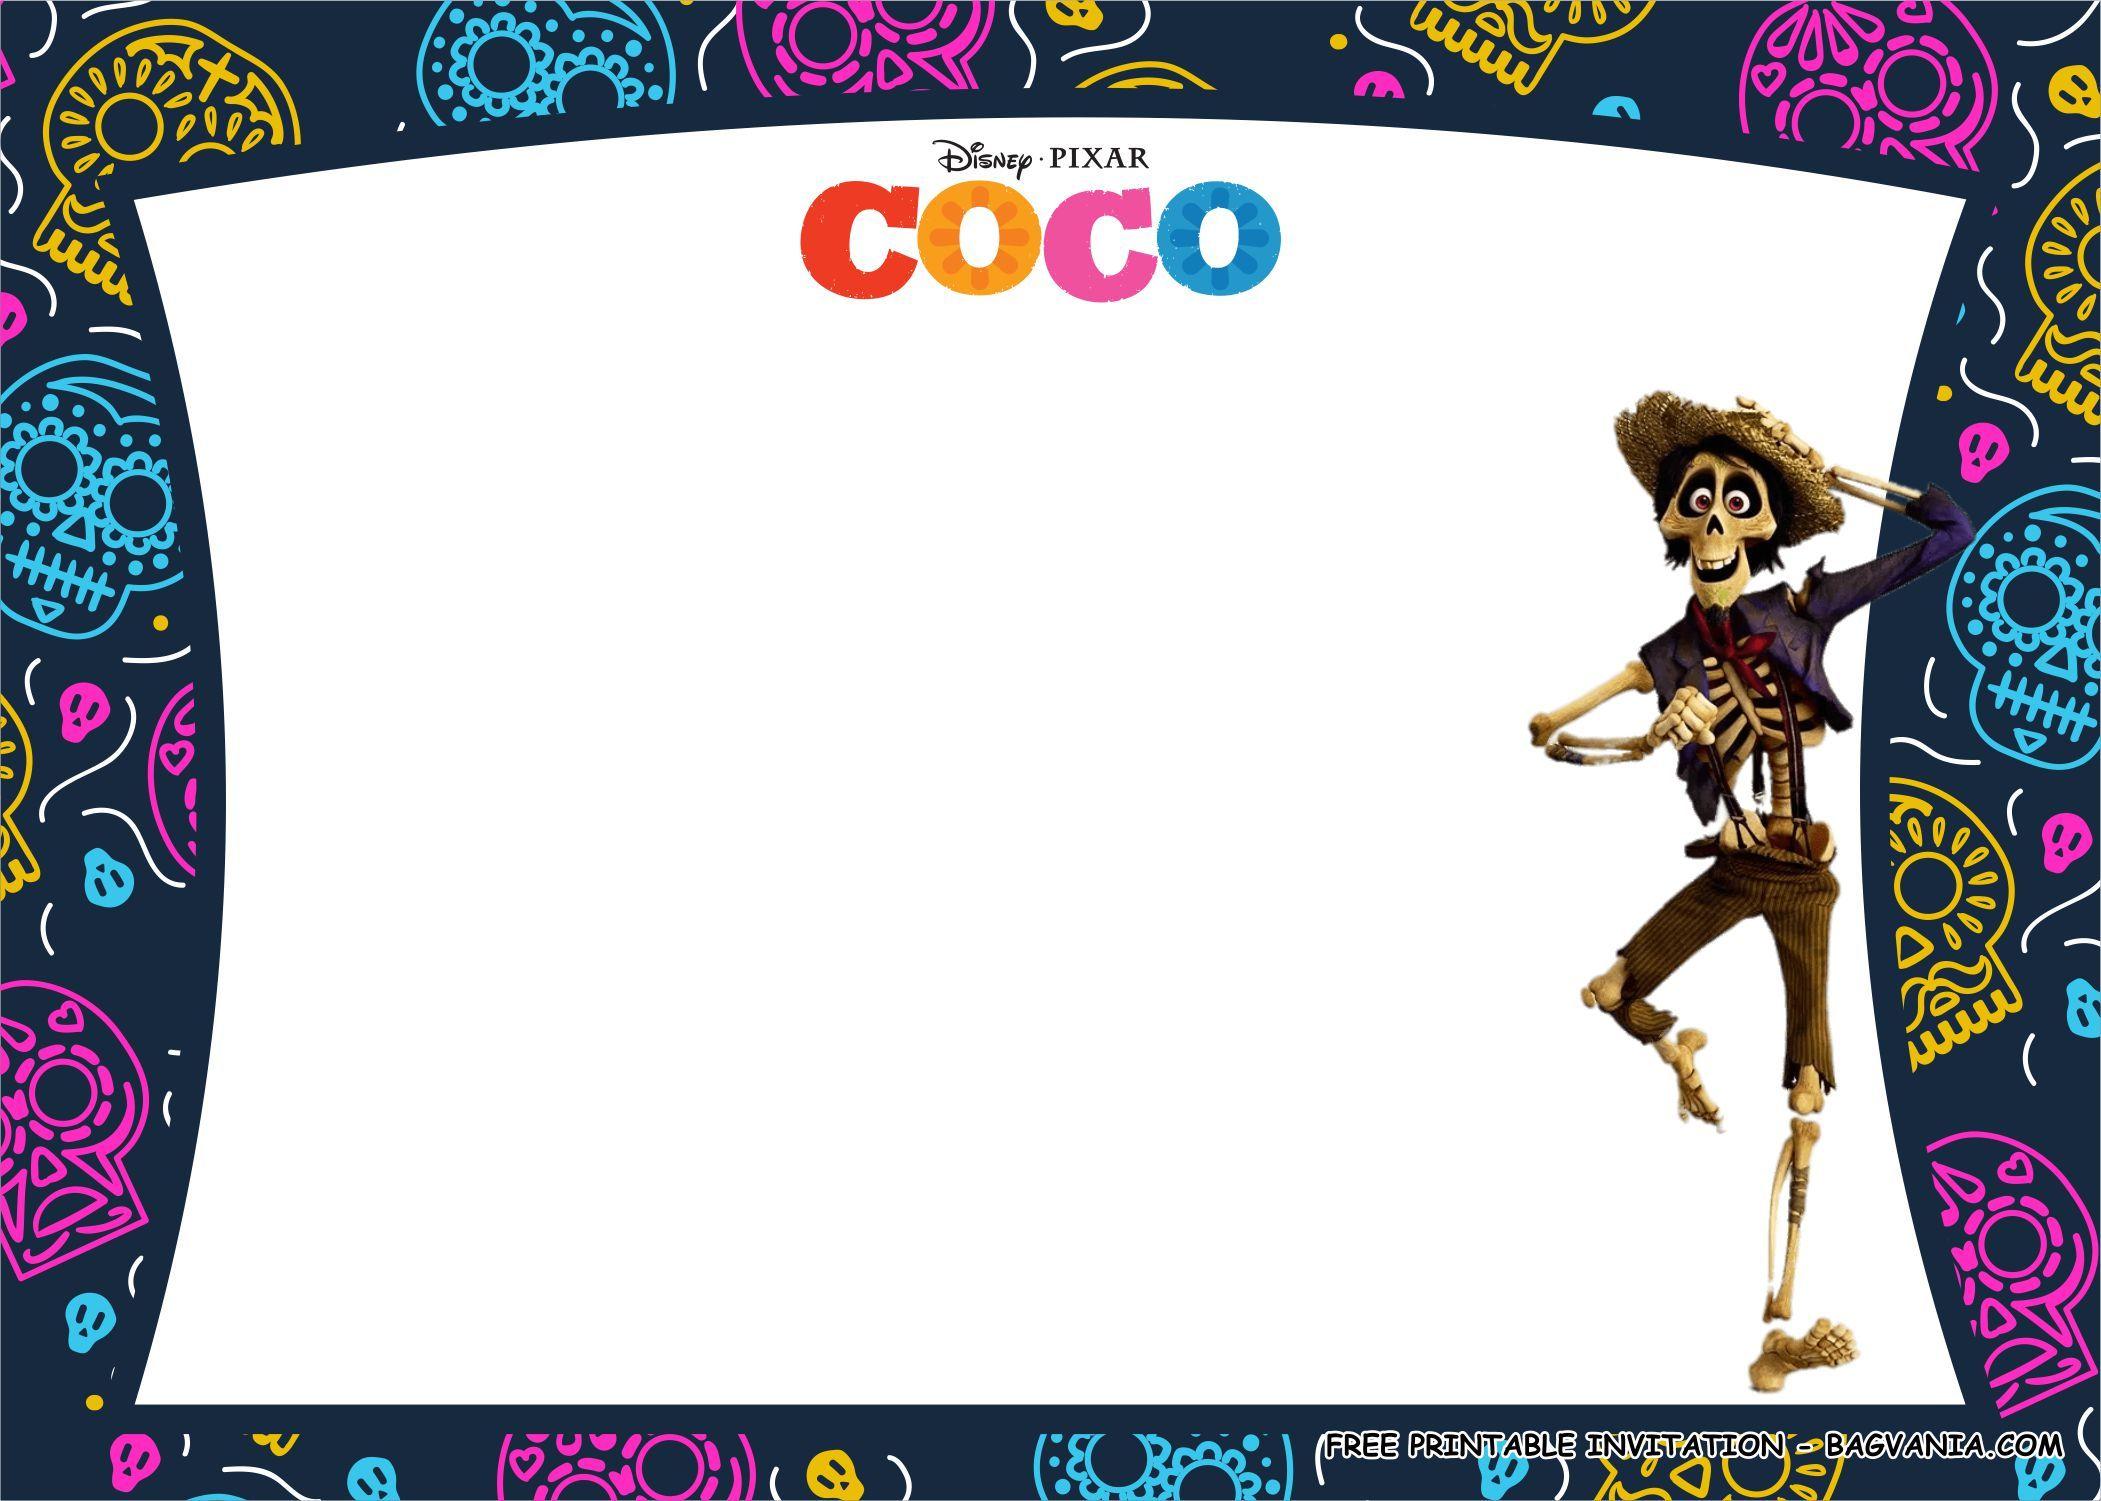 Free Printable Disney Coco Birthday Party Kits Template Birthday Party Kits Free Printable Birthday Invitations Free Birthday Invitation Templates